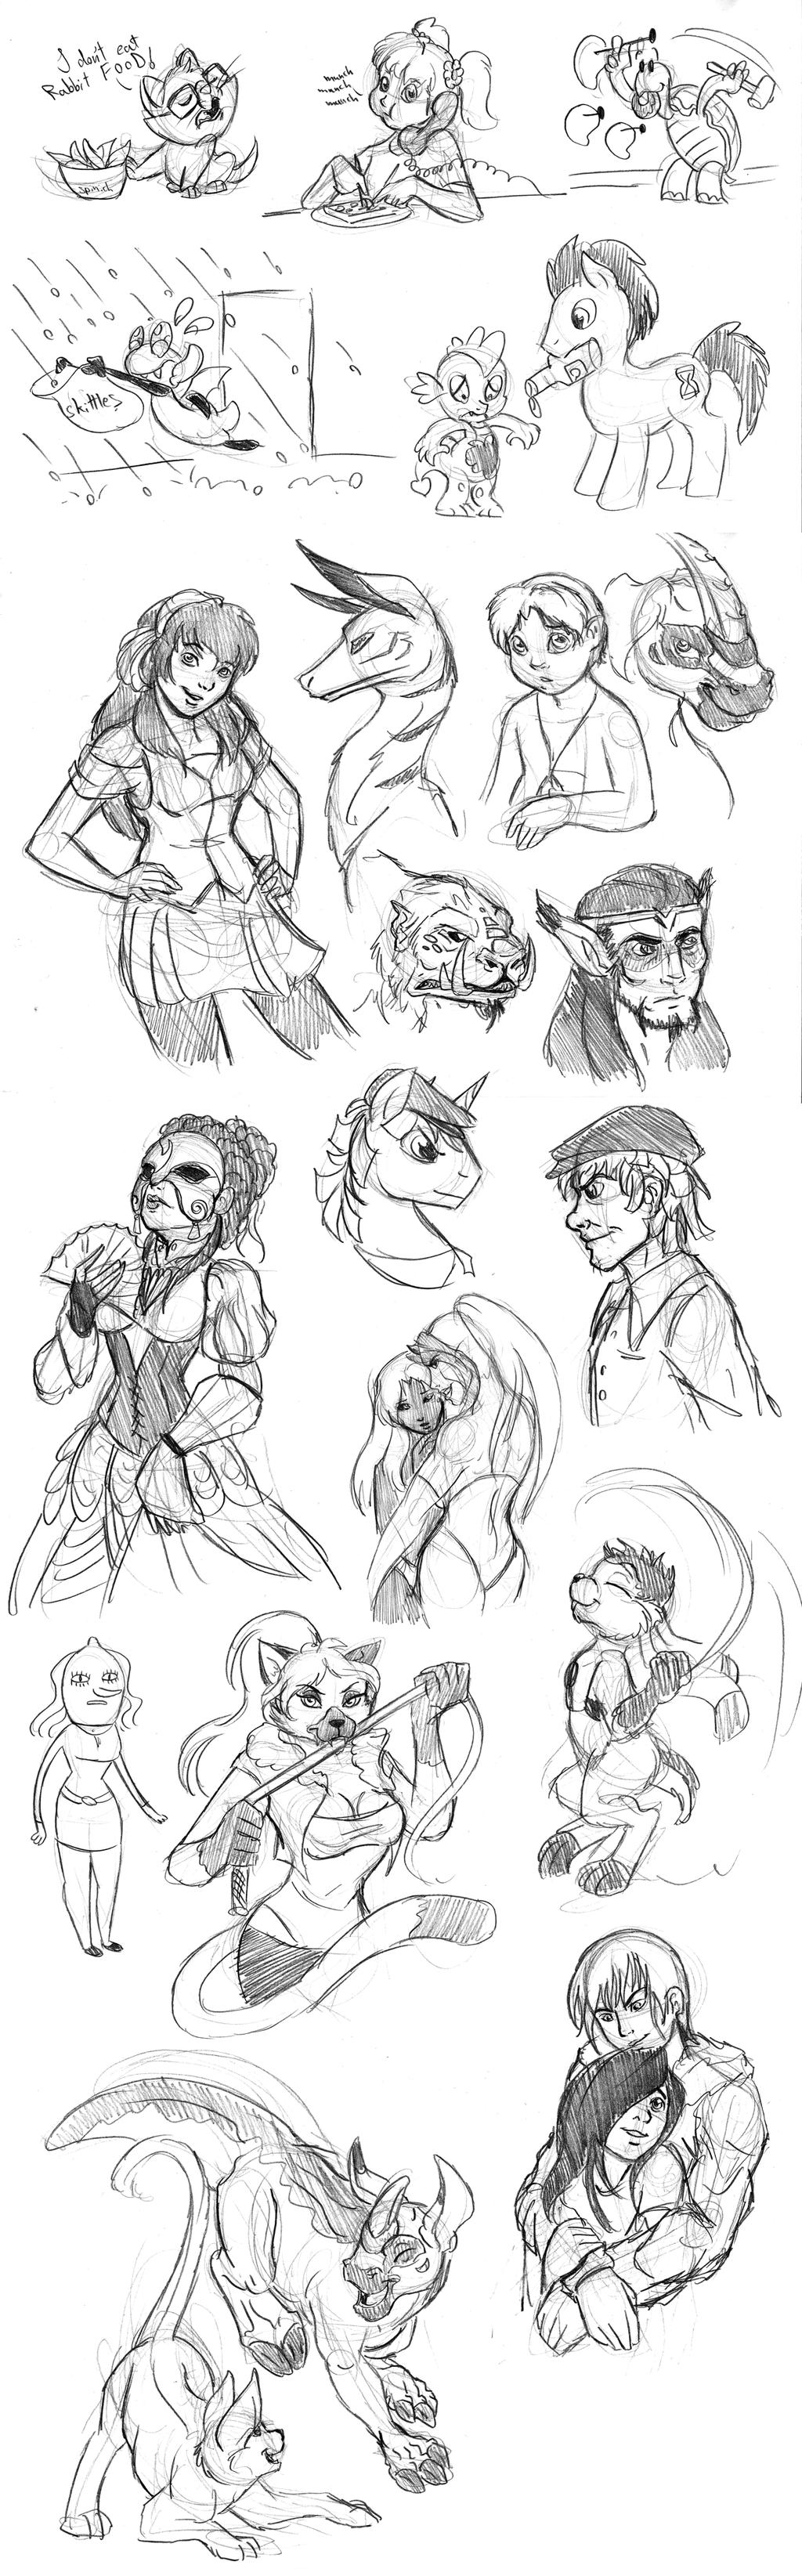 Livestream Sketch Requests - 07 by Wazaga